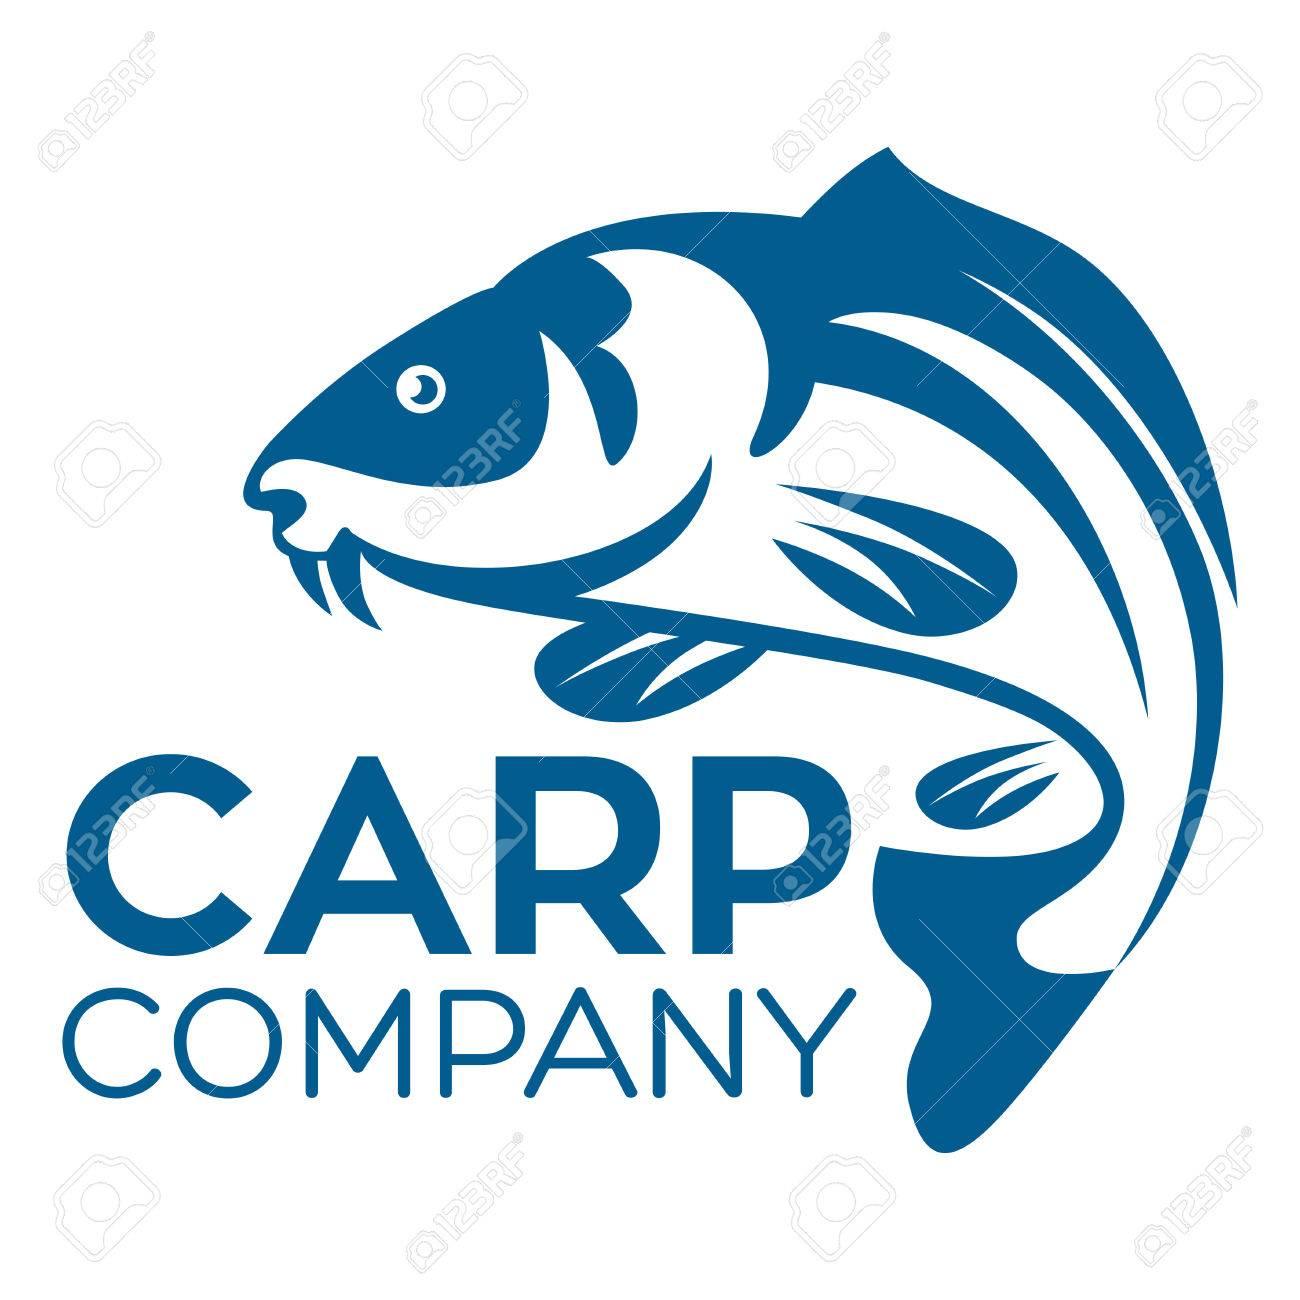 fish carp logo royalty free cliparts vectors and stock rh 123rf com carp log app carp logo football